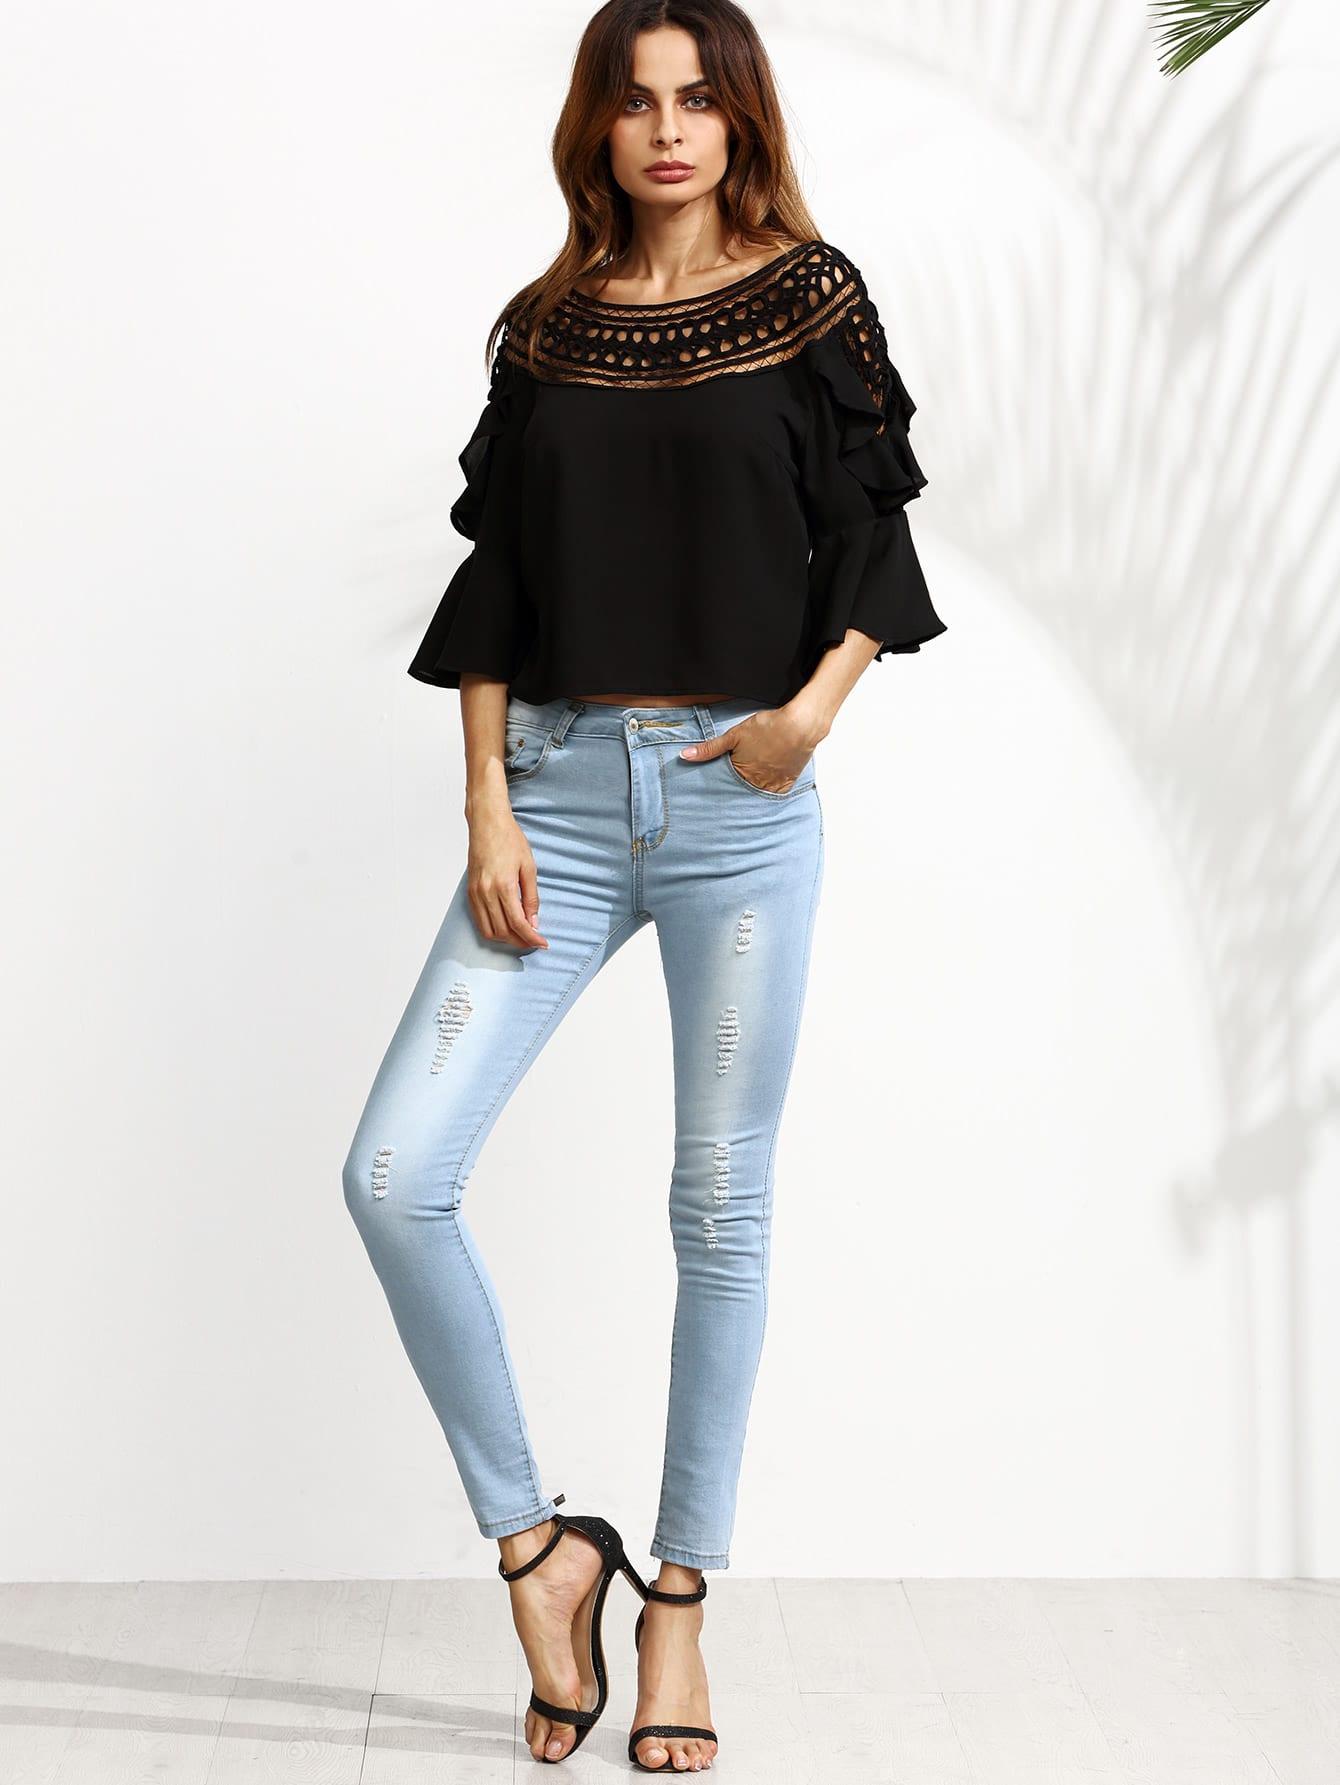 blouse160825501_2